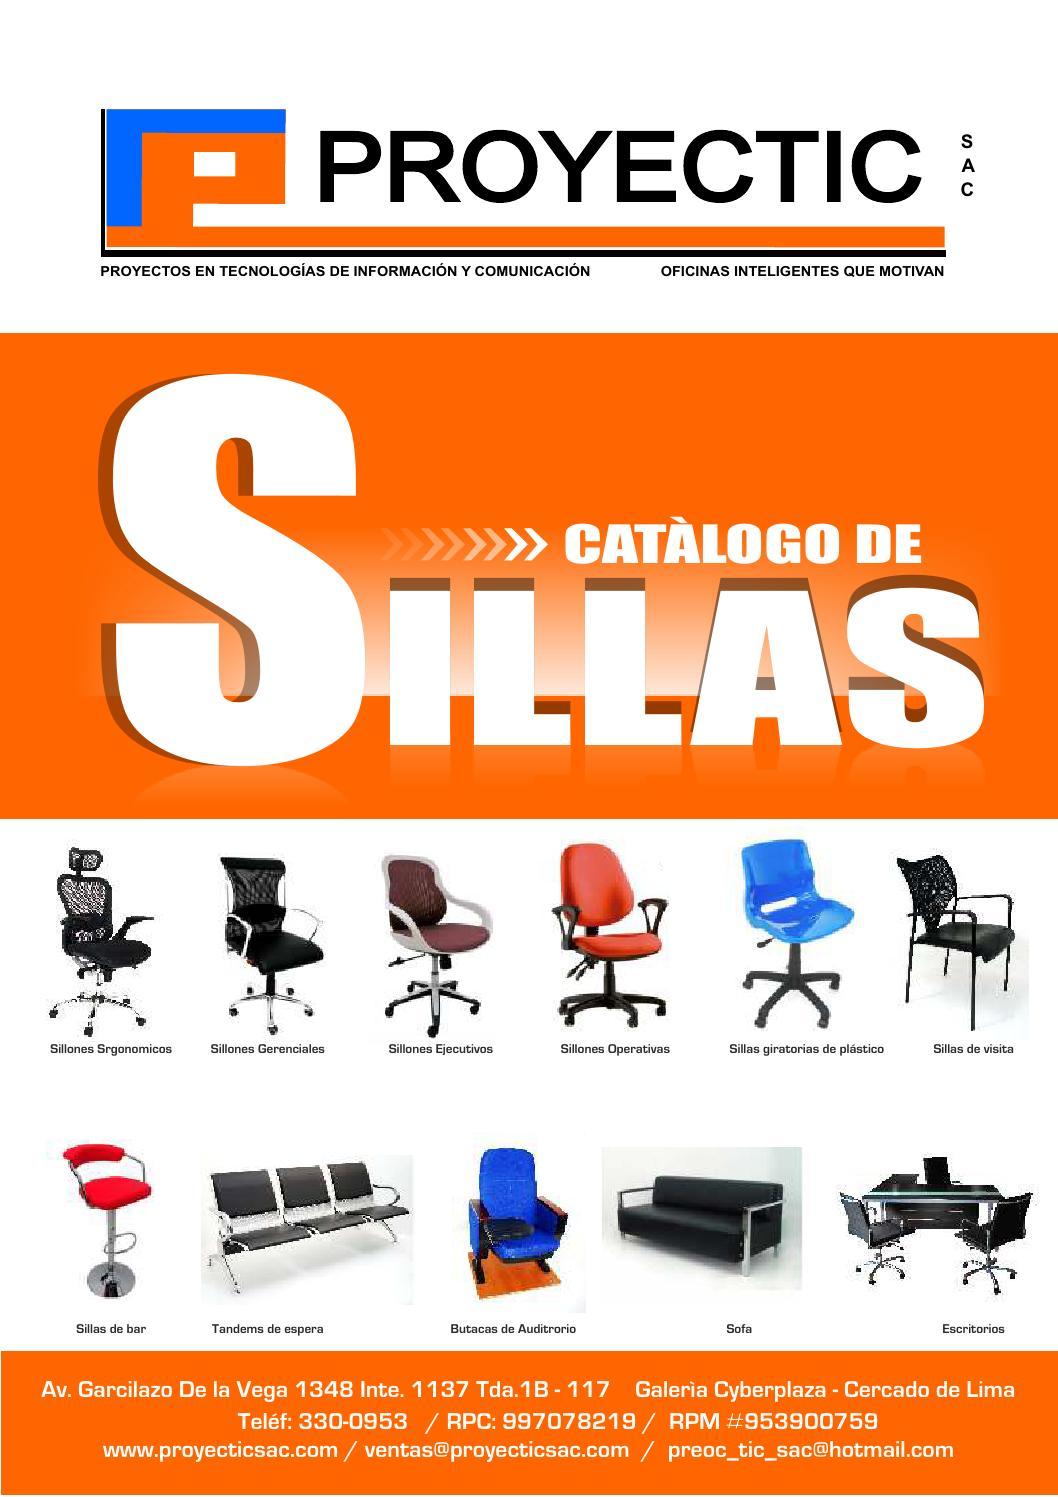 Proyectic catalogo de sillas by proyectic issuu for Catalogo de sillas